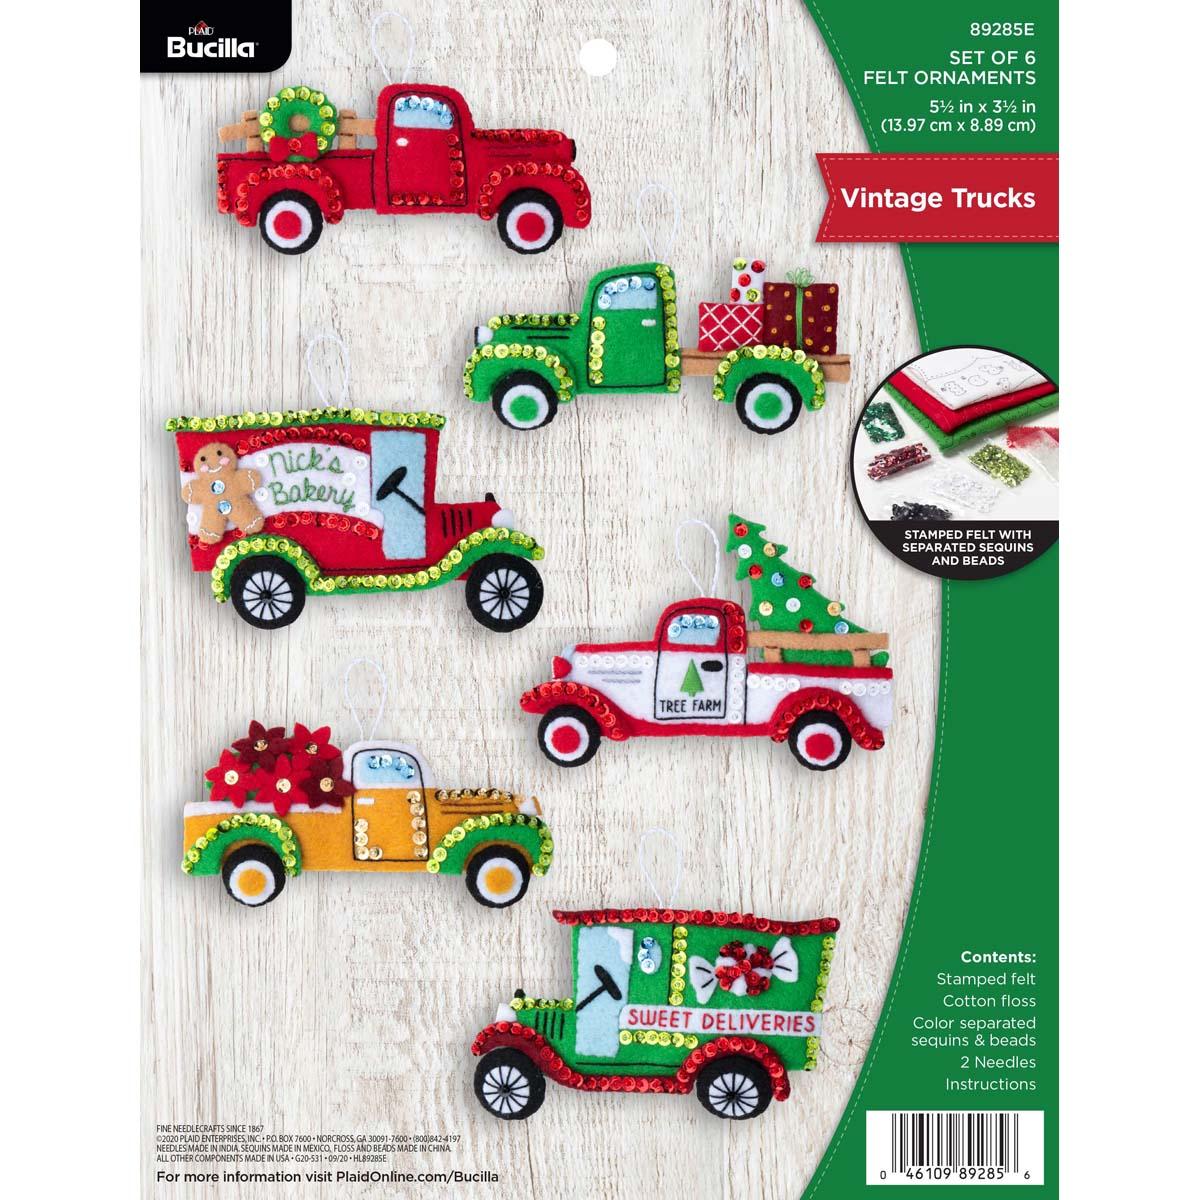 Bucilla ® Seasonal - Felt - Ornament Kits - Vintage Trucks - 89285E